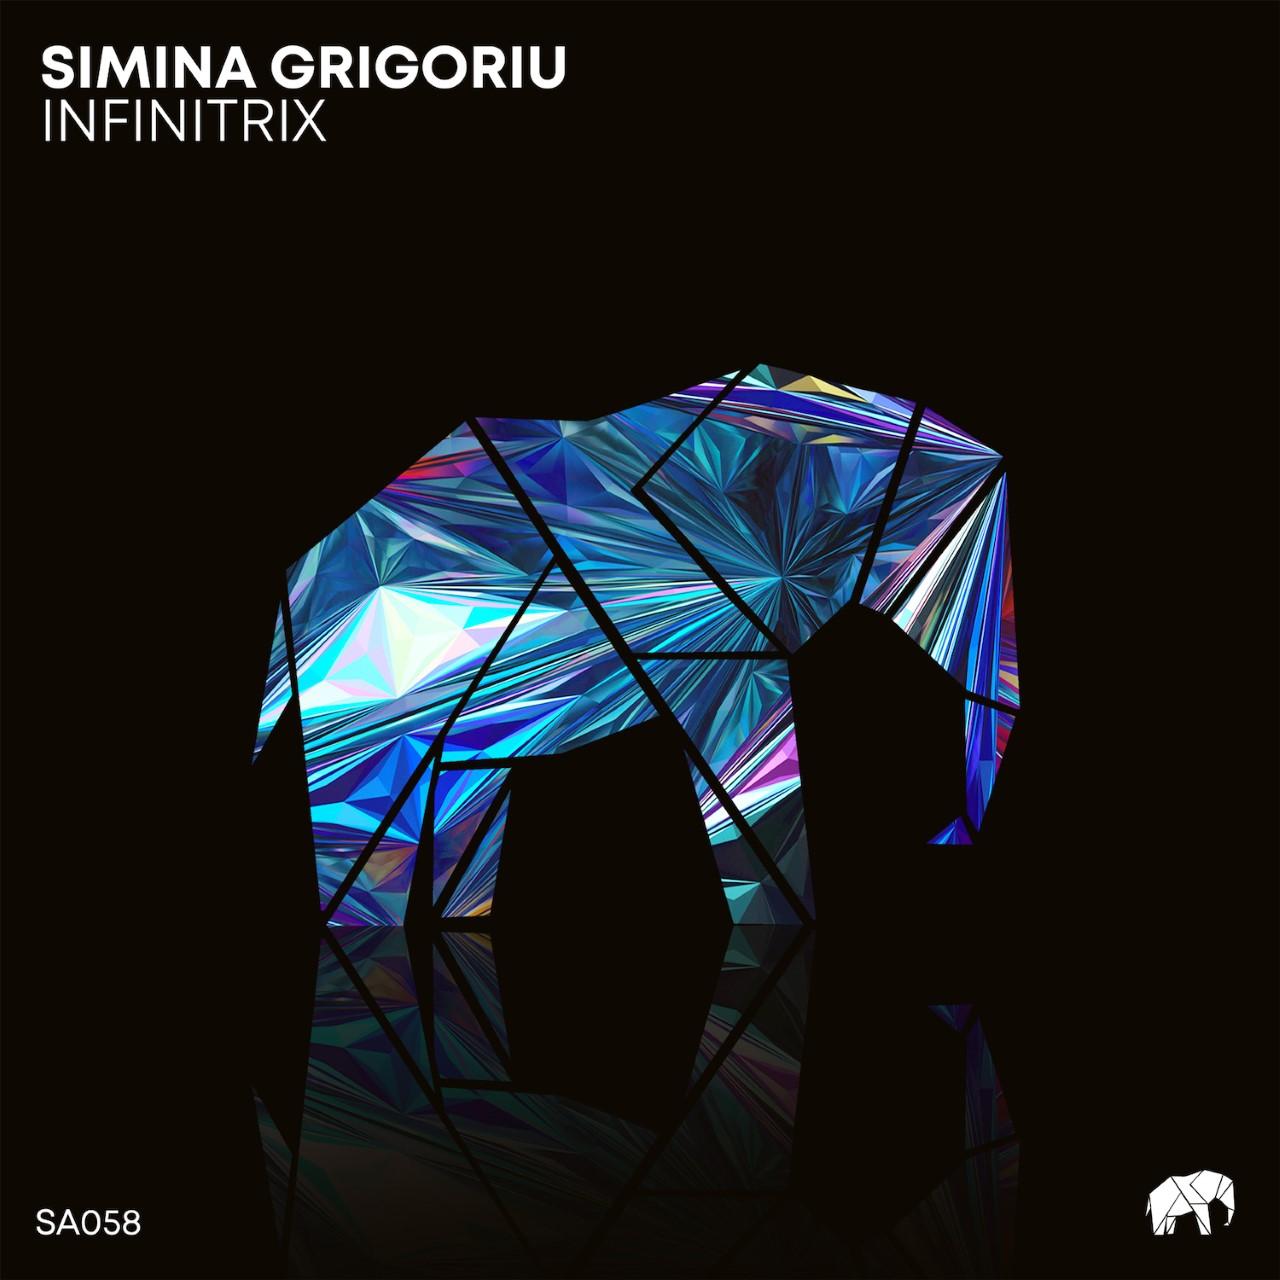 SIMINA GRIGORIU DEBUTS ON SET ABOUT WITH HARD HITTING 'INFINITRIX ...